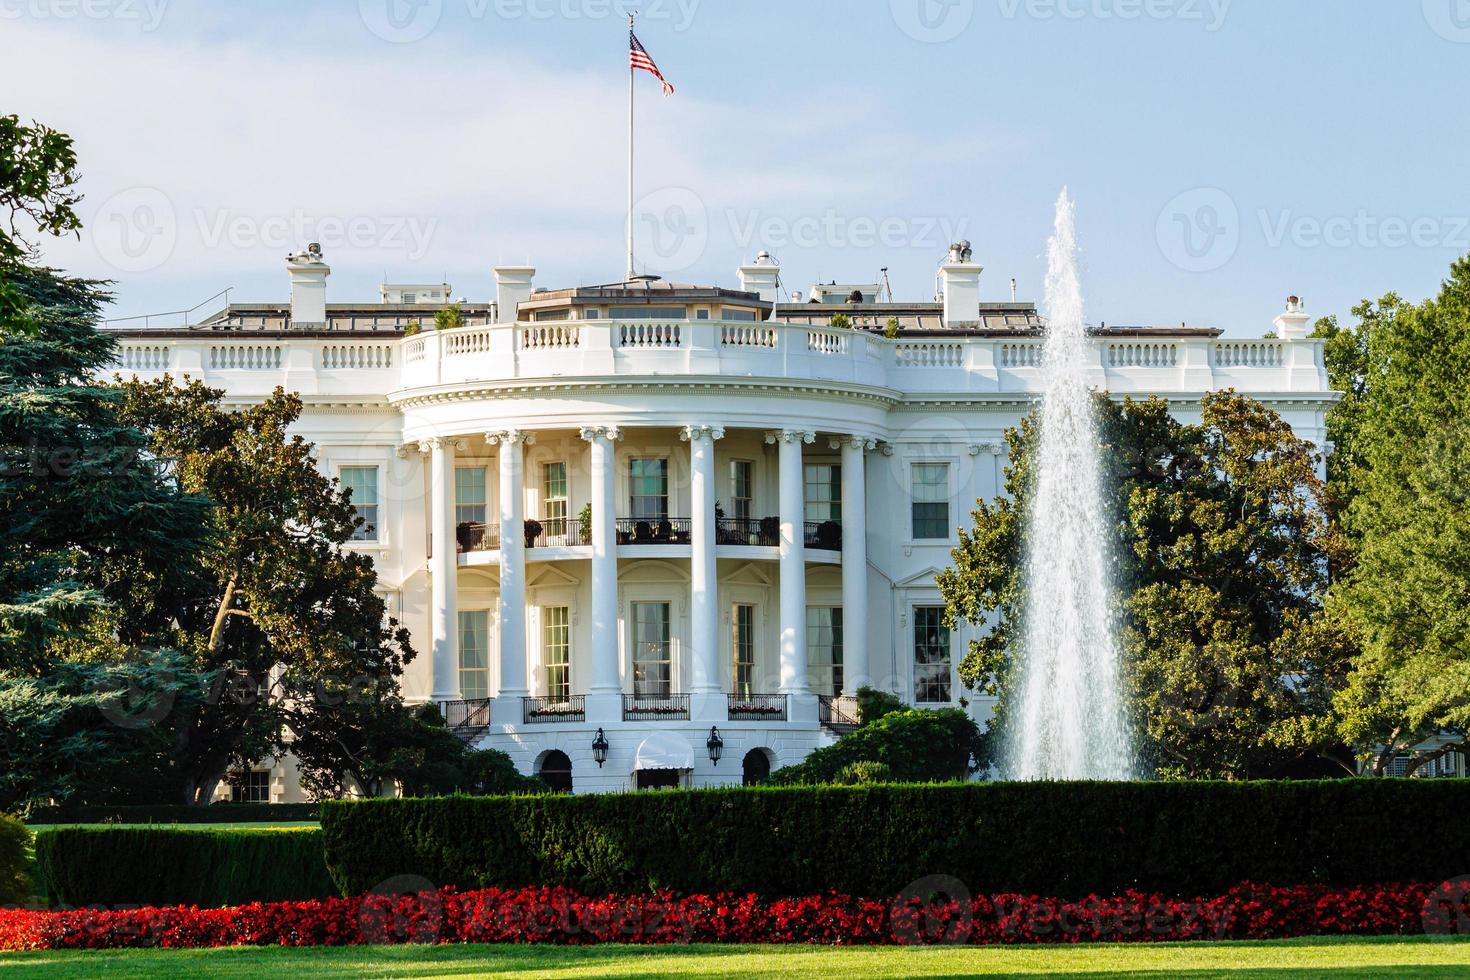 The White House photo